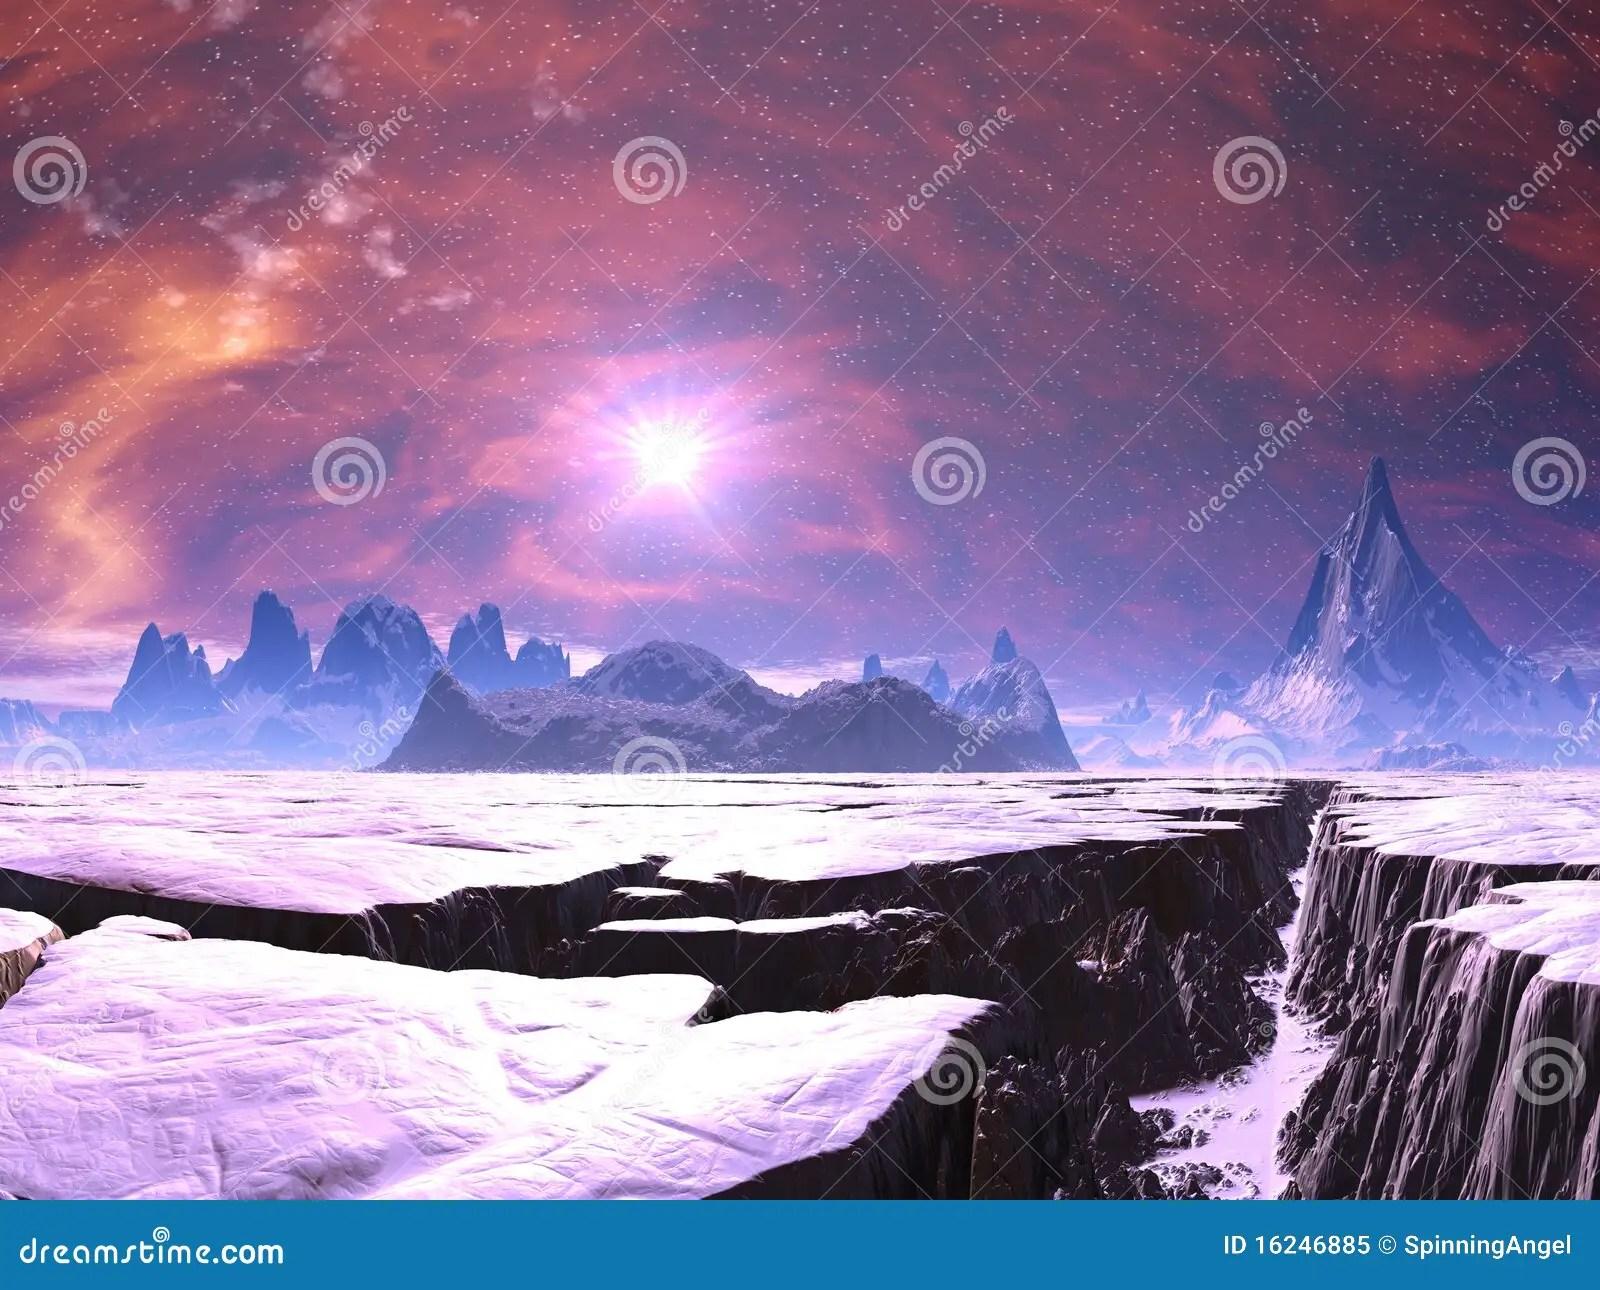 Wallpaper Hd Snow Falling Earthquake Chasm On Alien Ice Planet Stock Illustration